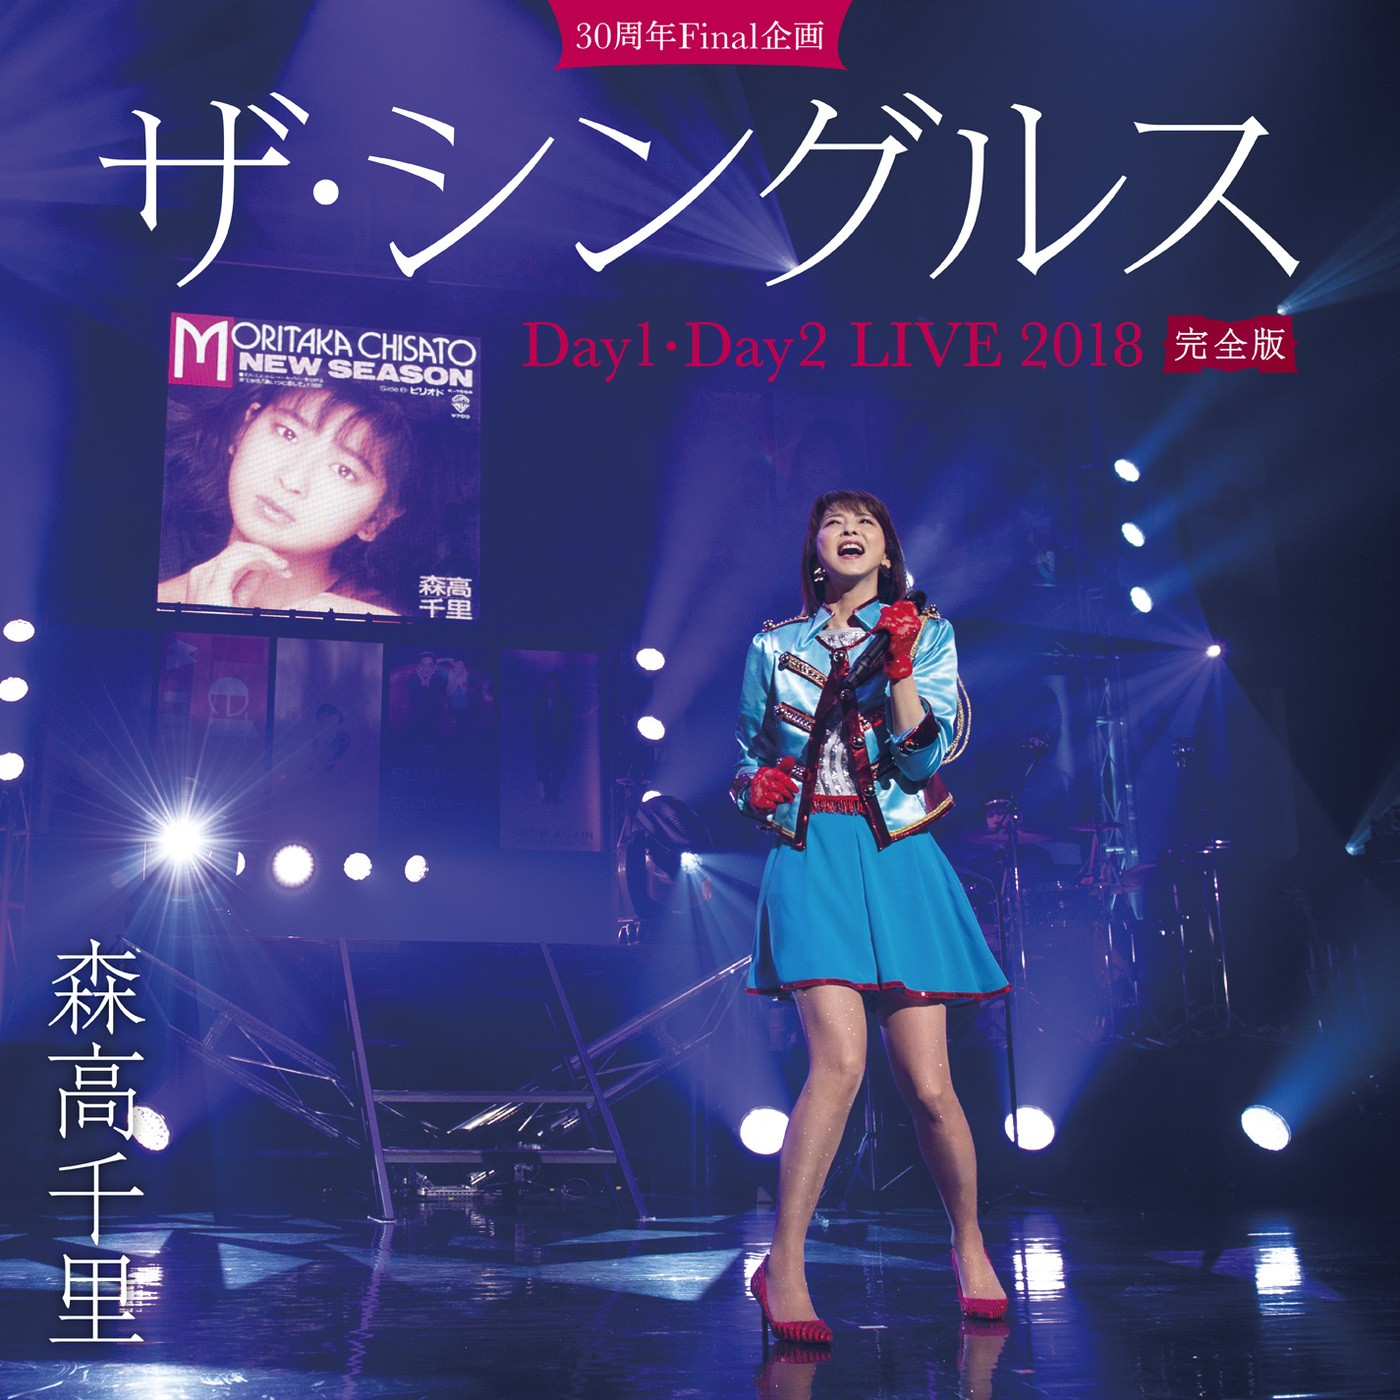 [Album] 森高千里 (Chisato Moritaka) – ザ・シングルス」Day1・Day2 LIVE 2018 完全版 [FLAC + MP3 320 / WEB] [2019.05.22]